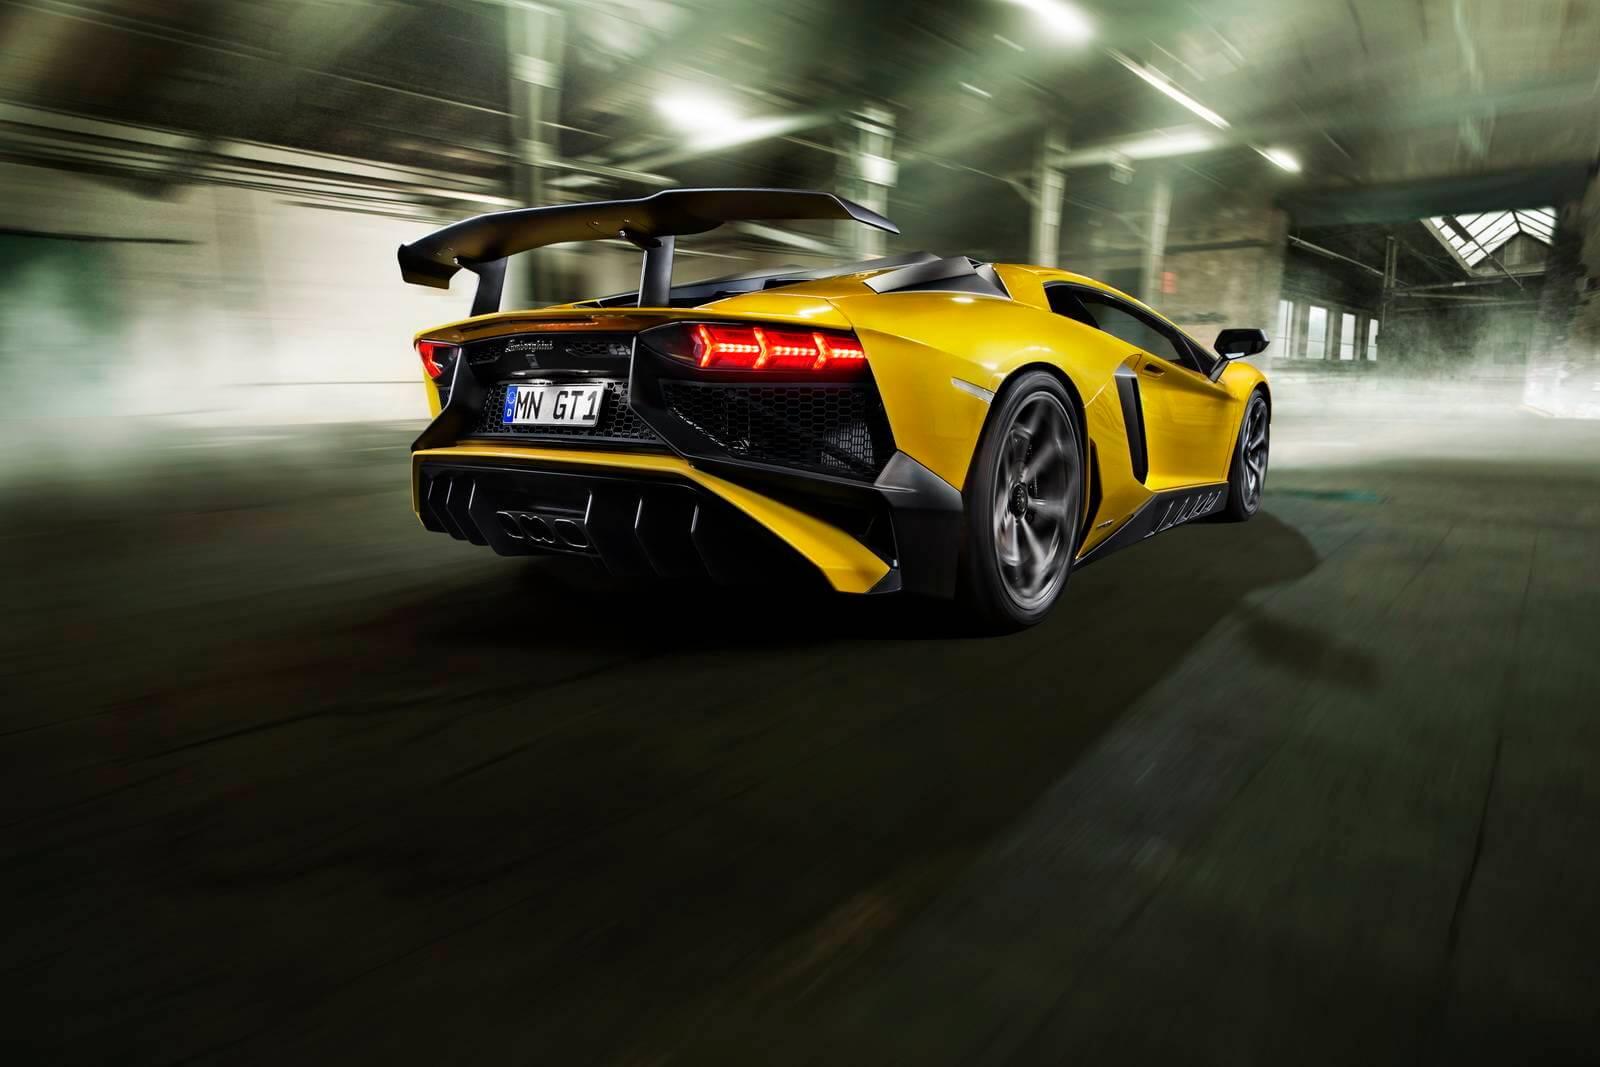 Novitec-Torado-Lamborghini-Aventador-SV-wallpaper-wp5209863